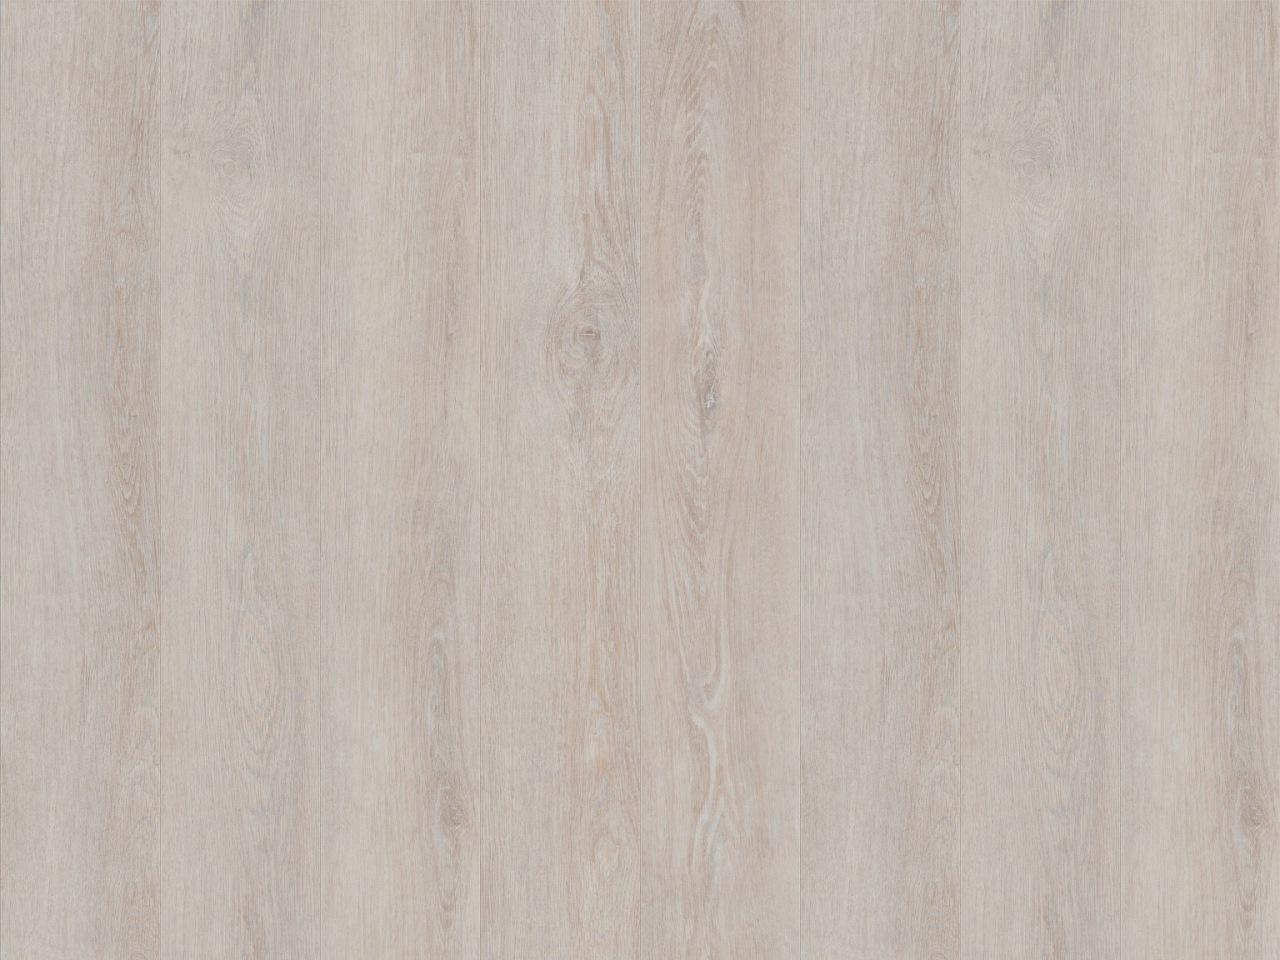 Designbelag Rico wood – Eiche Delft, 328003